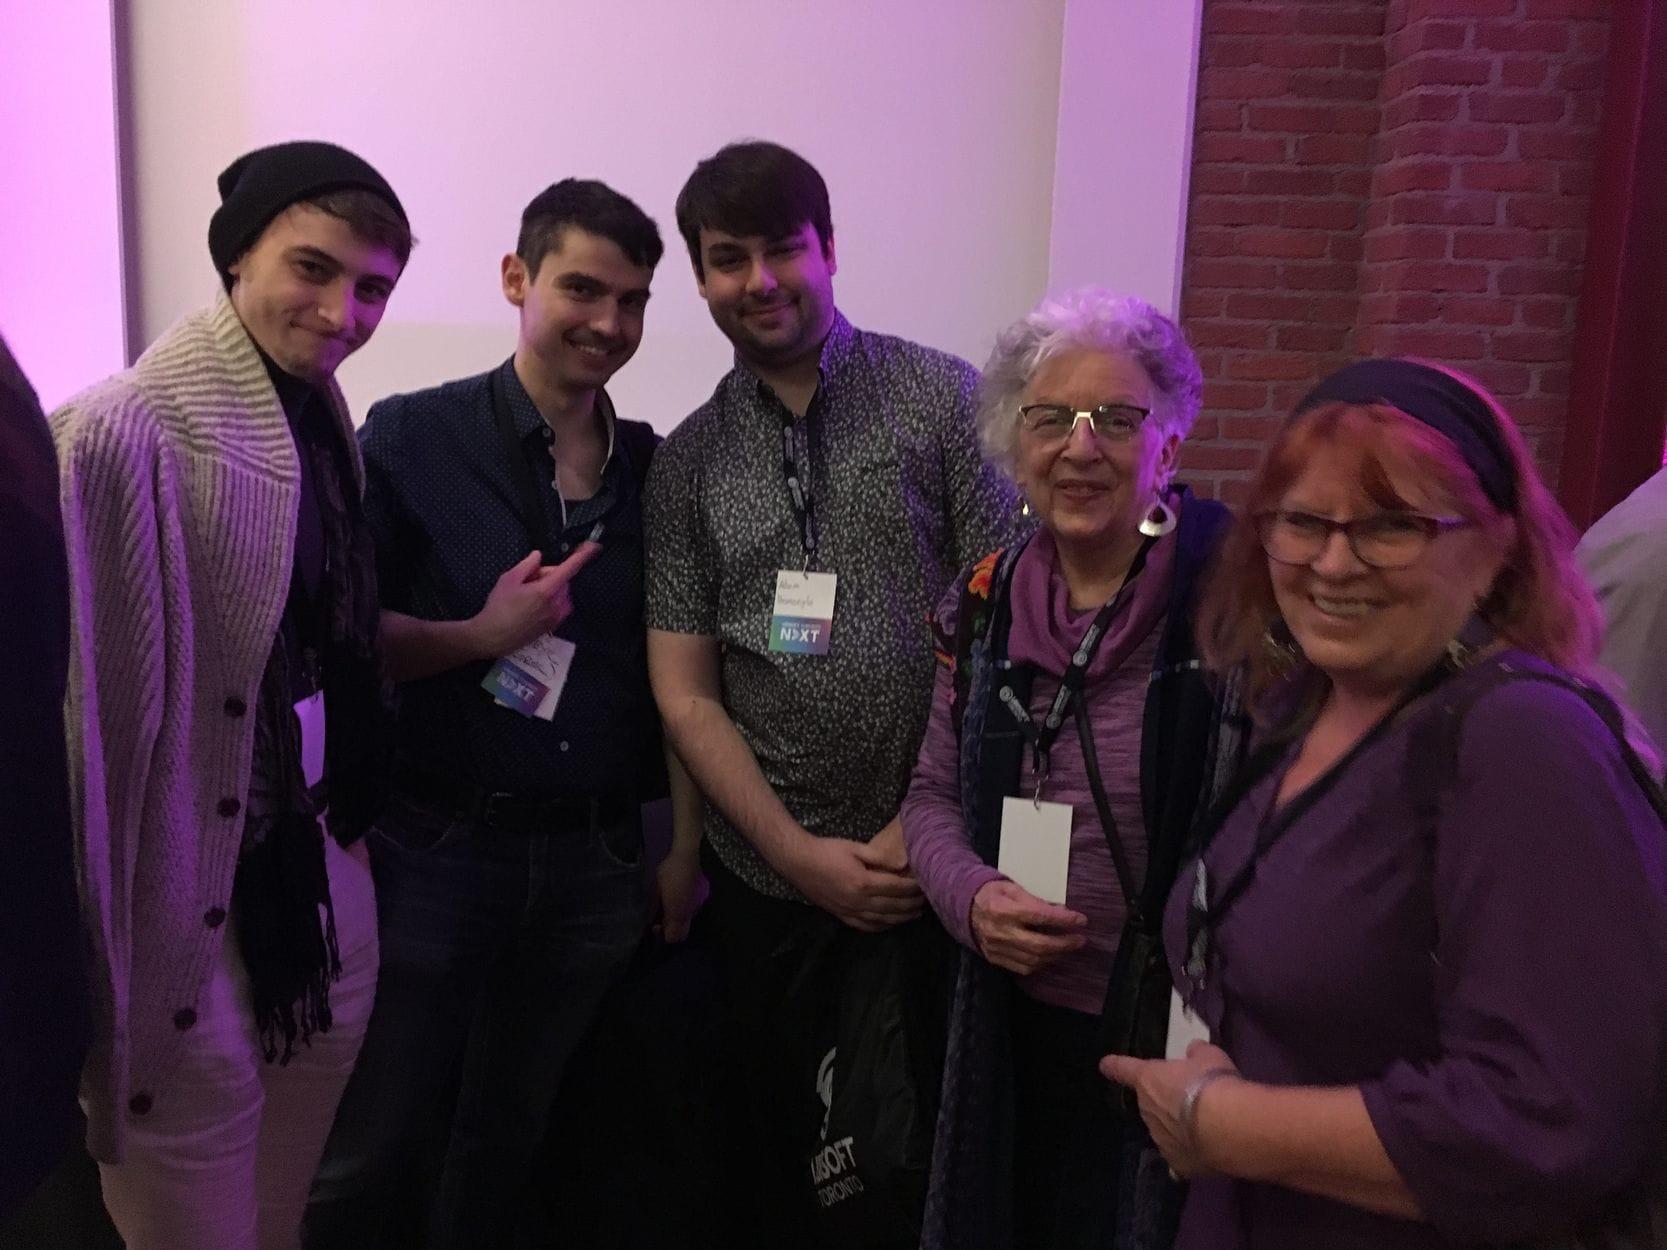 Sergi Iranzo, friend, Adam Homonylo, Maxine Schacker, Co-Director, and Hilary Phillips, Concept Art Coordinator, at the 2019 Ubisoft Nxt Awards